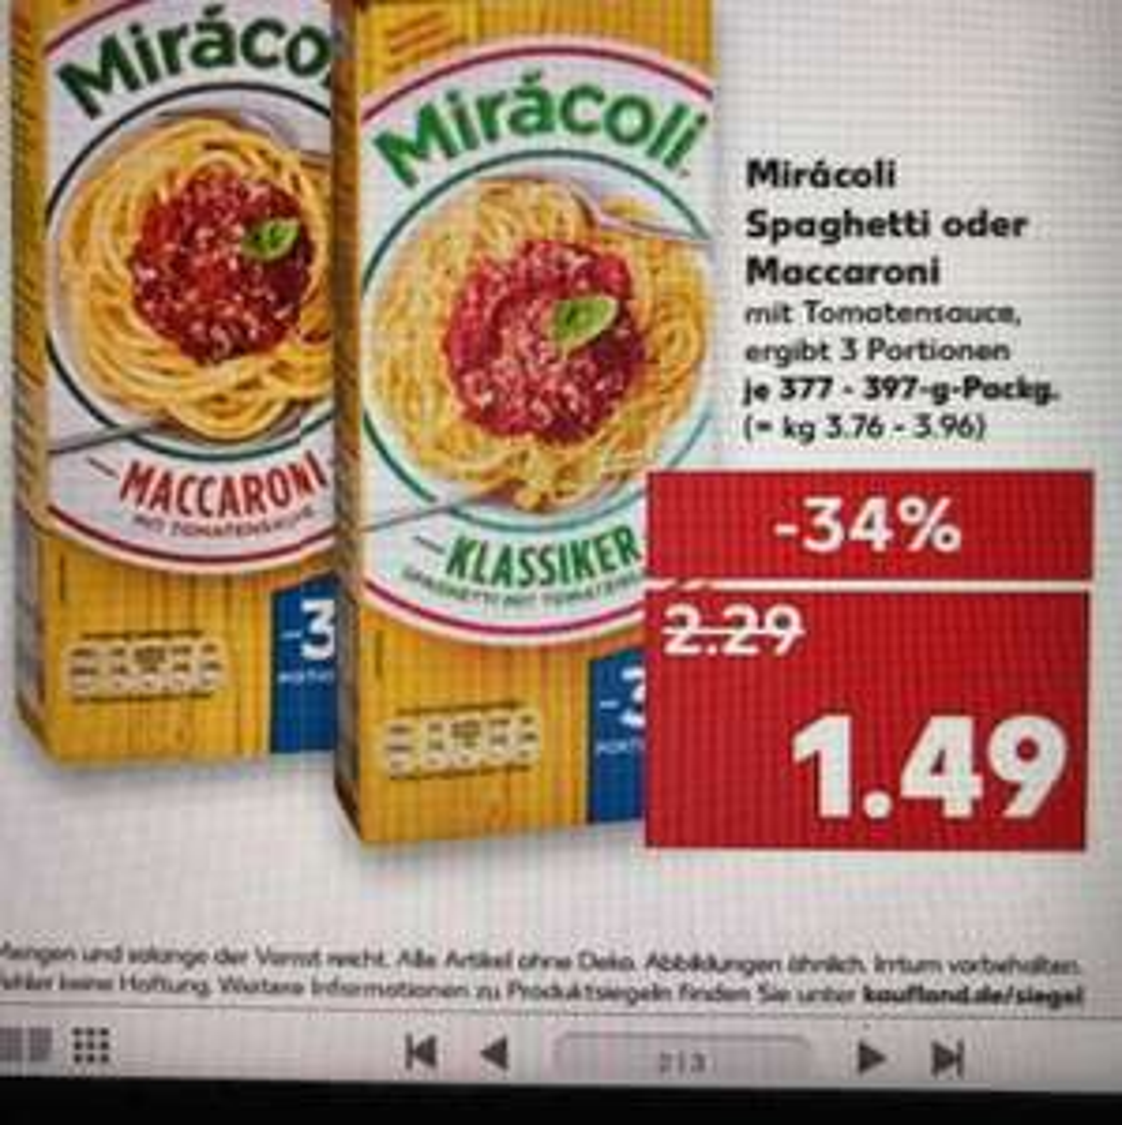 [Kaufland] 3x Miracoli x 1,49 = 4,47€ -2€ Coupon 2,47€